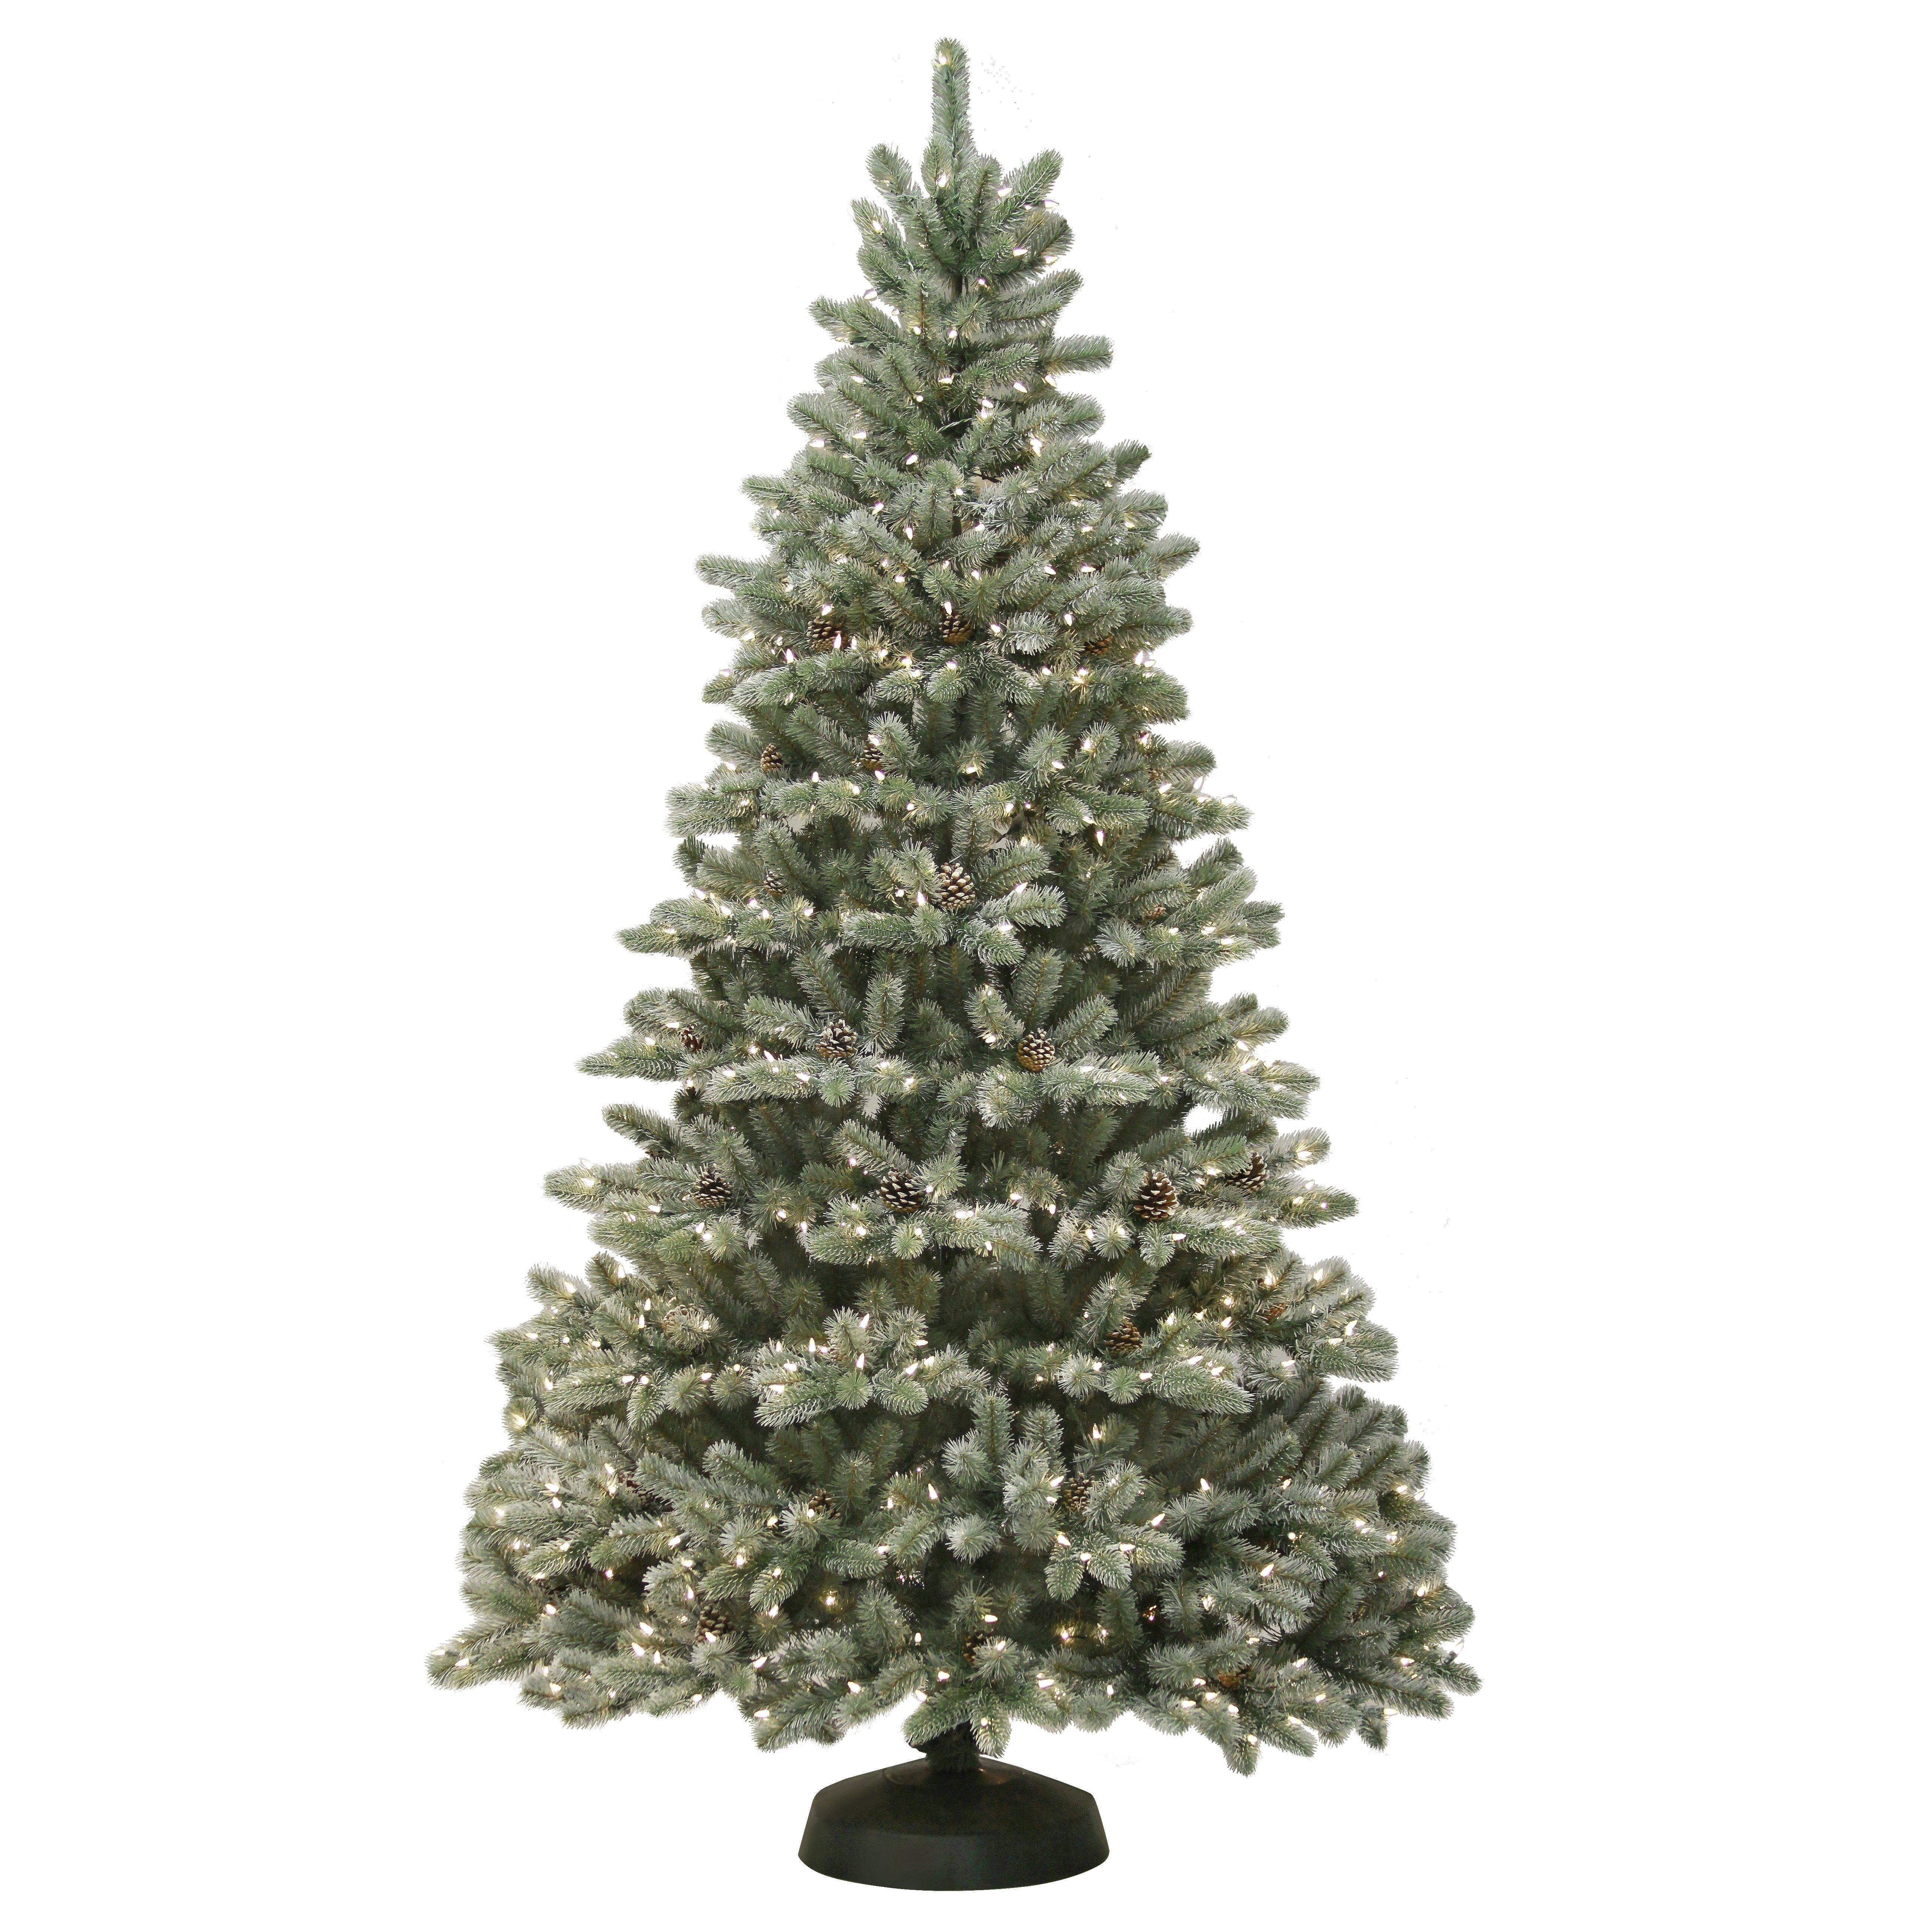 General Foam Plastics Kincade 7' Green Artificial Christmas Tree ...